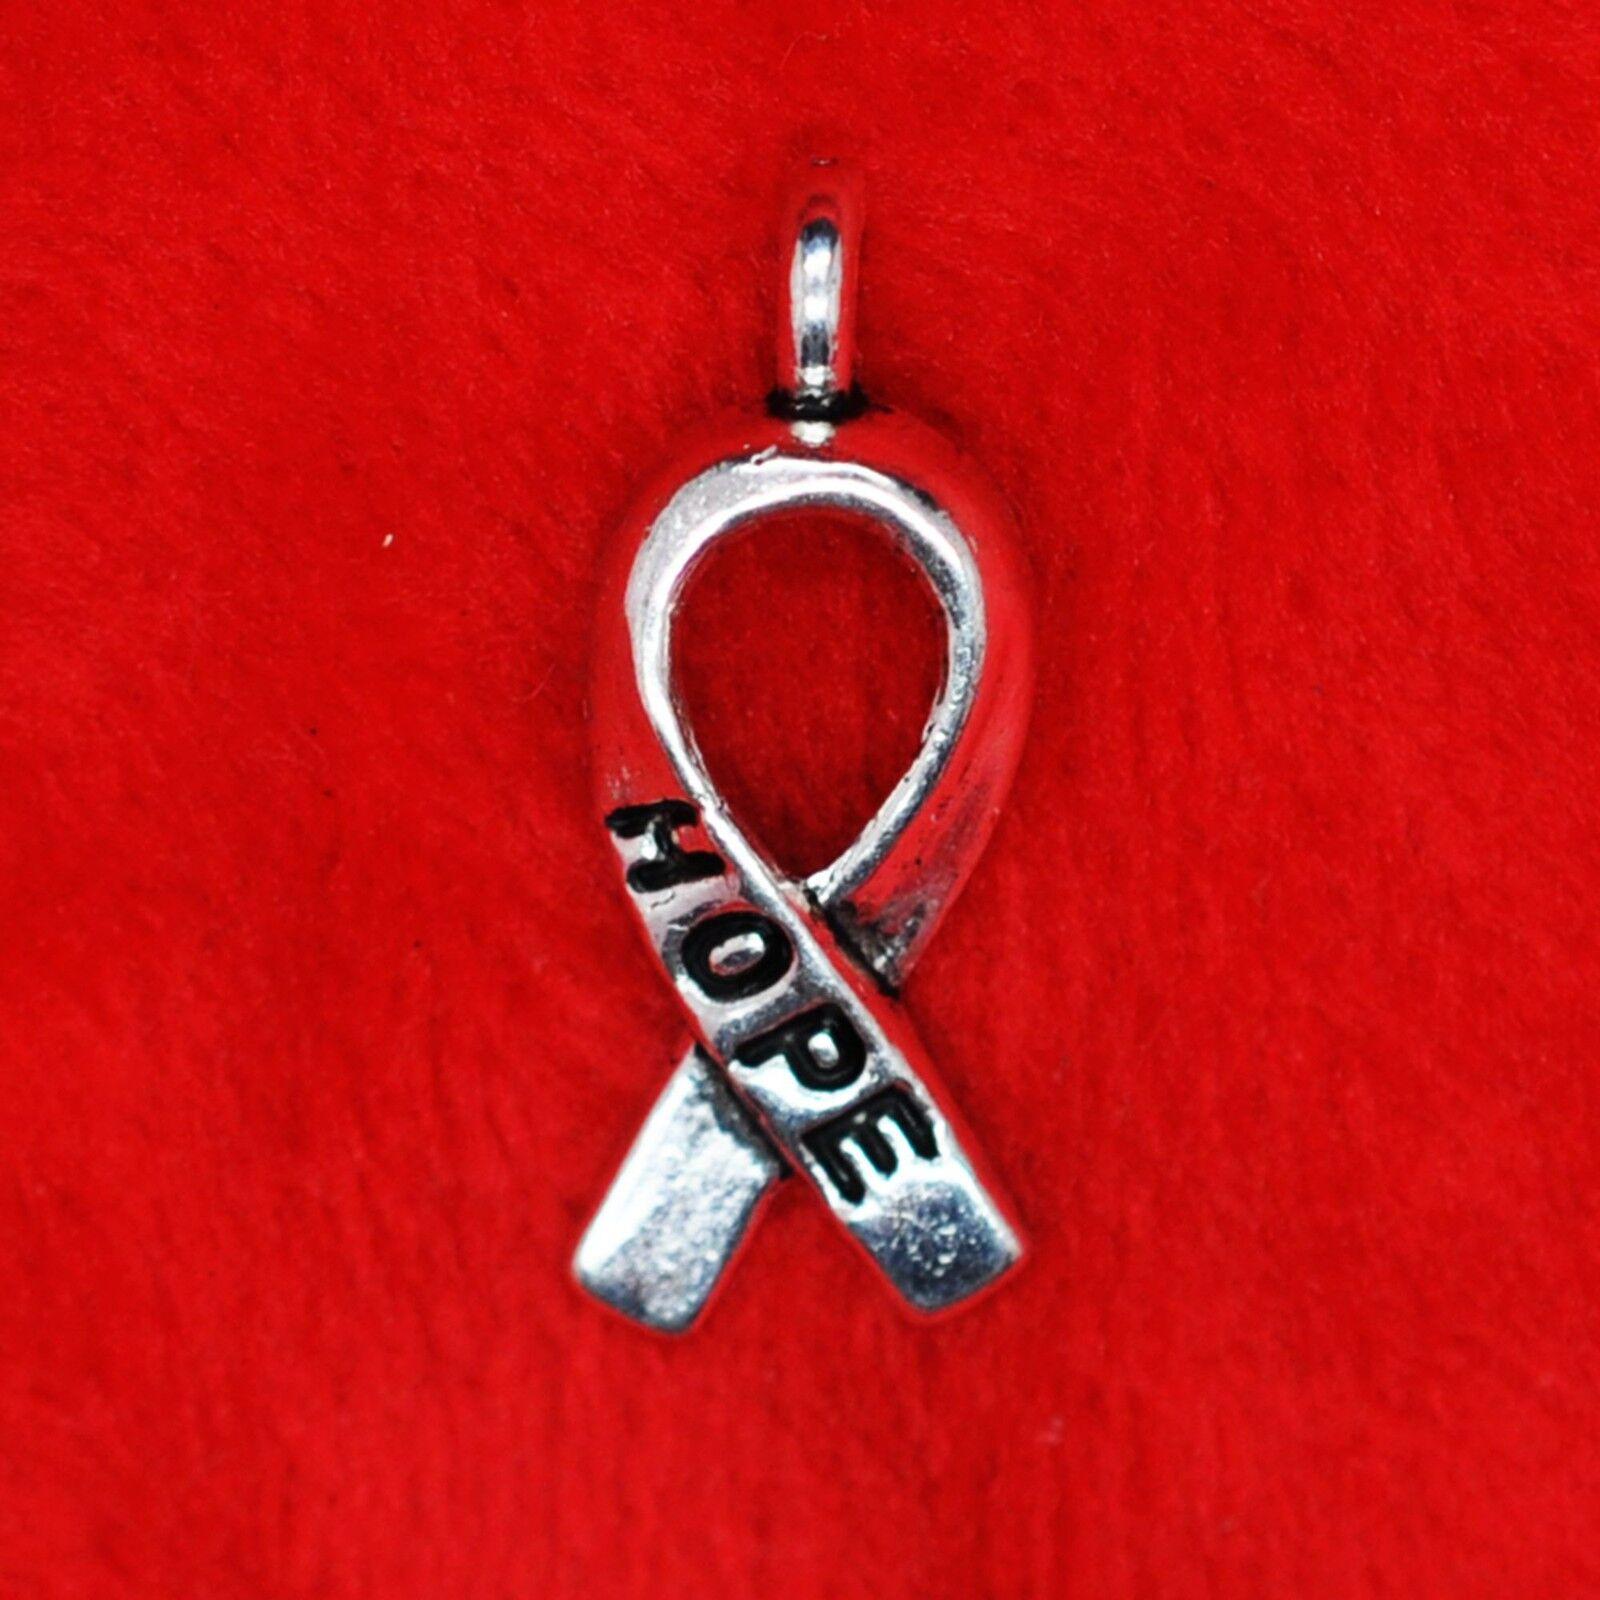 ❤ 20 x Silver Tone HEART Charm Pendant 20mm Jewellery Making Set 3 ❤